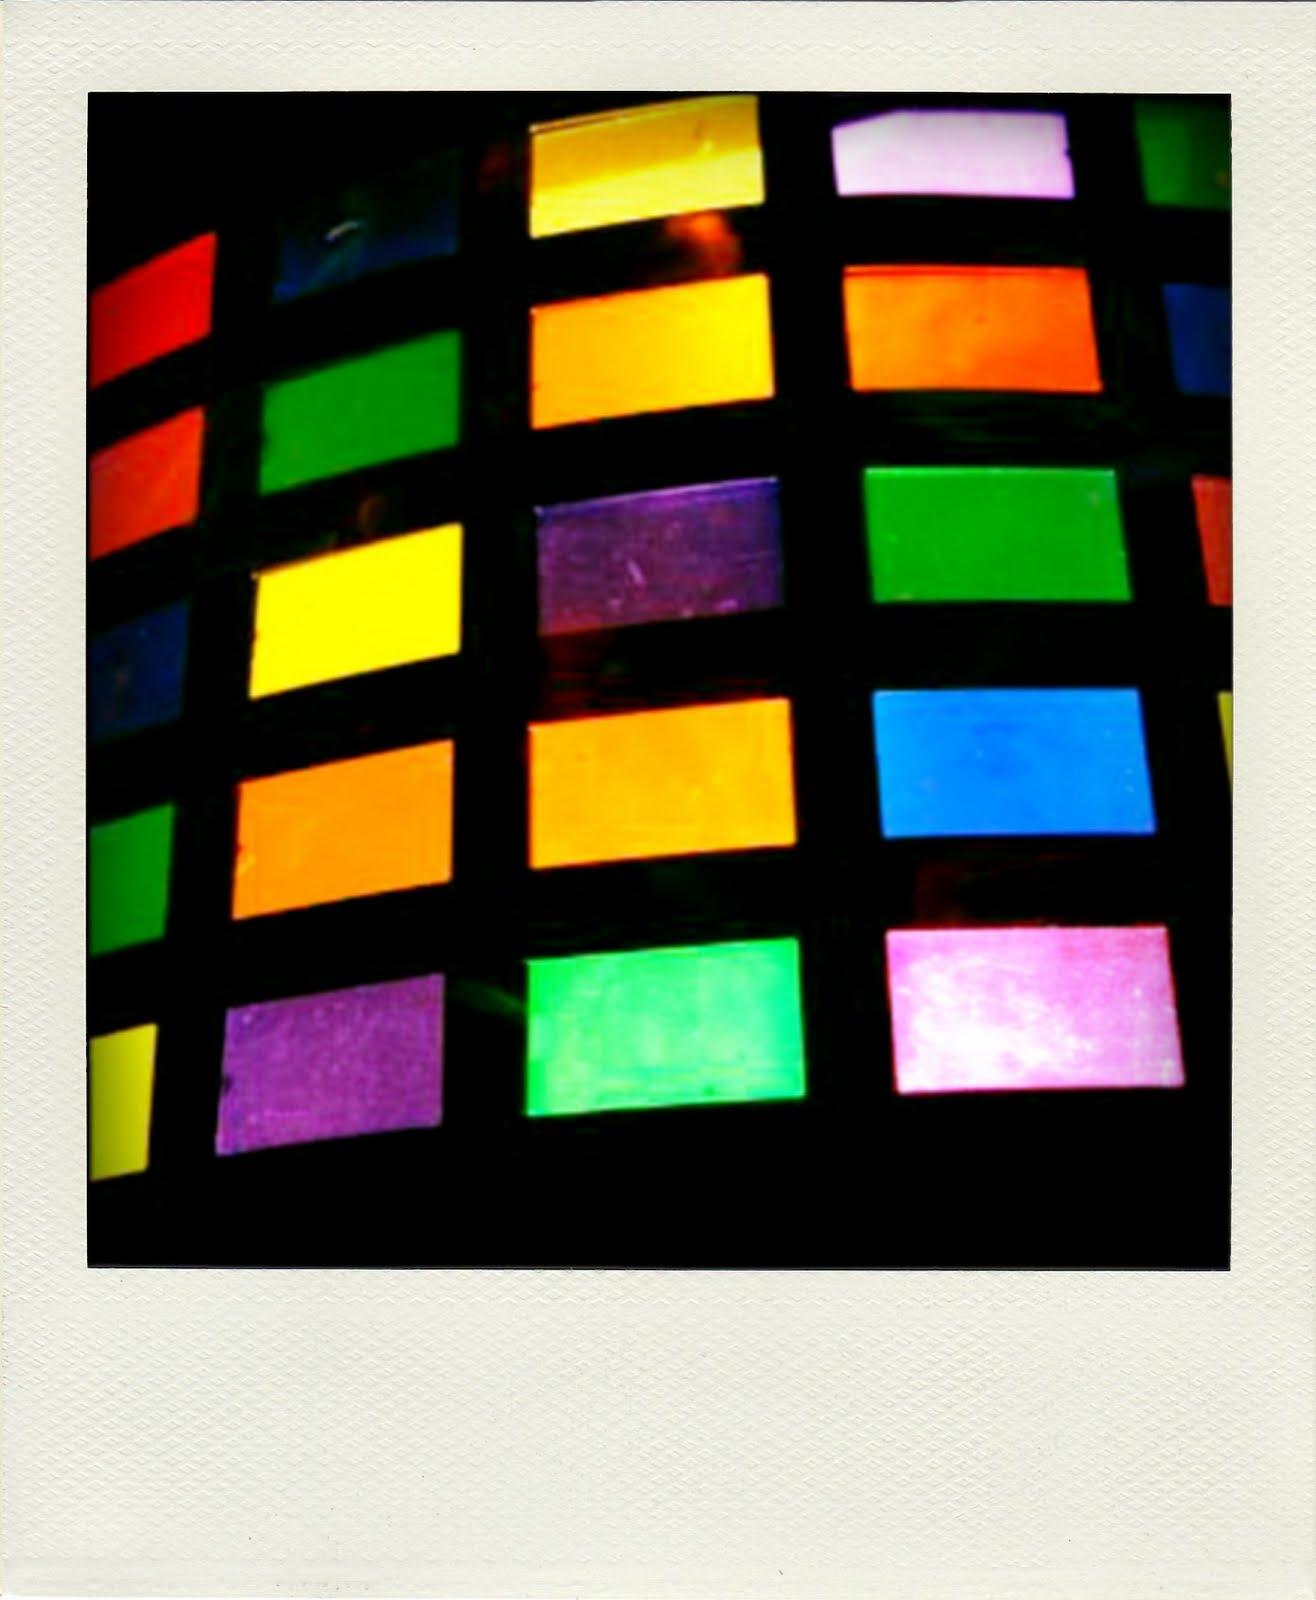 http://1.bp.blogspot.com/_0OABEPOmeKY/TNKaikxubeI/AAAAAAAAAqk/s4EIwGKkCJQ/s1600/%27All+Of+The+Lights%27+kanye,+rihanna,+elton+john,+josual+molou.jpg